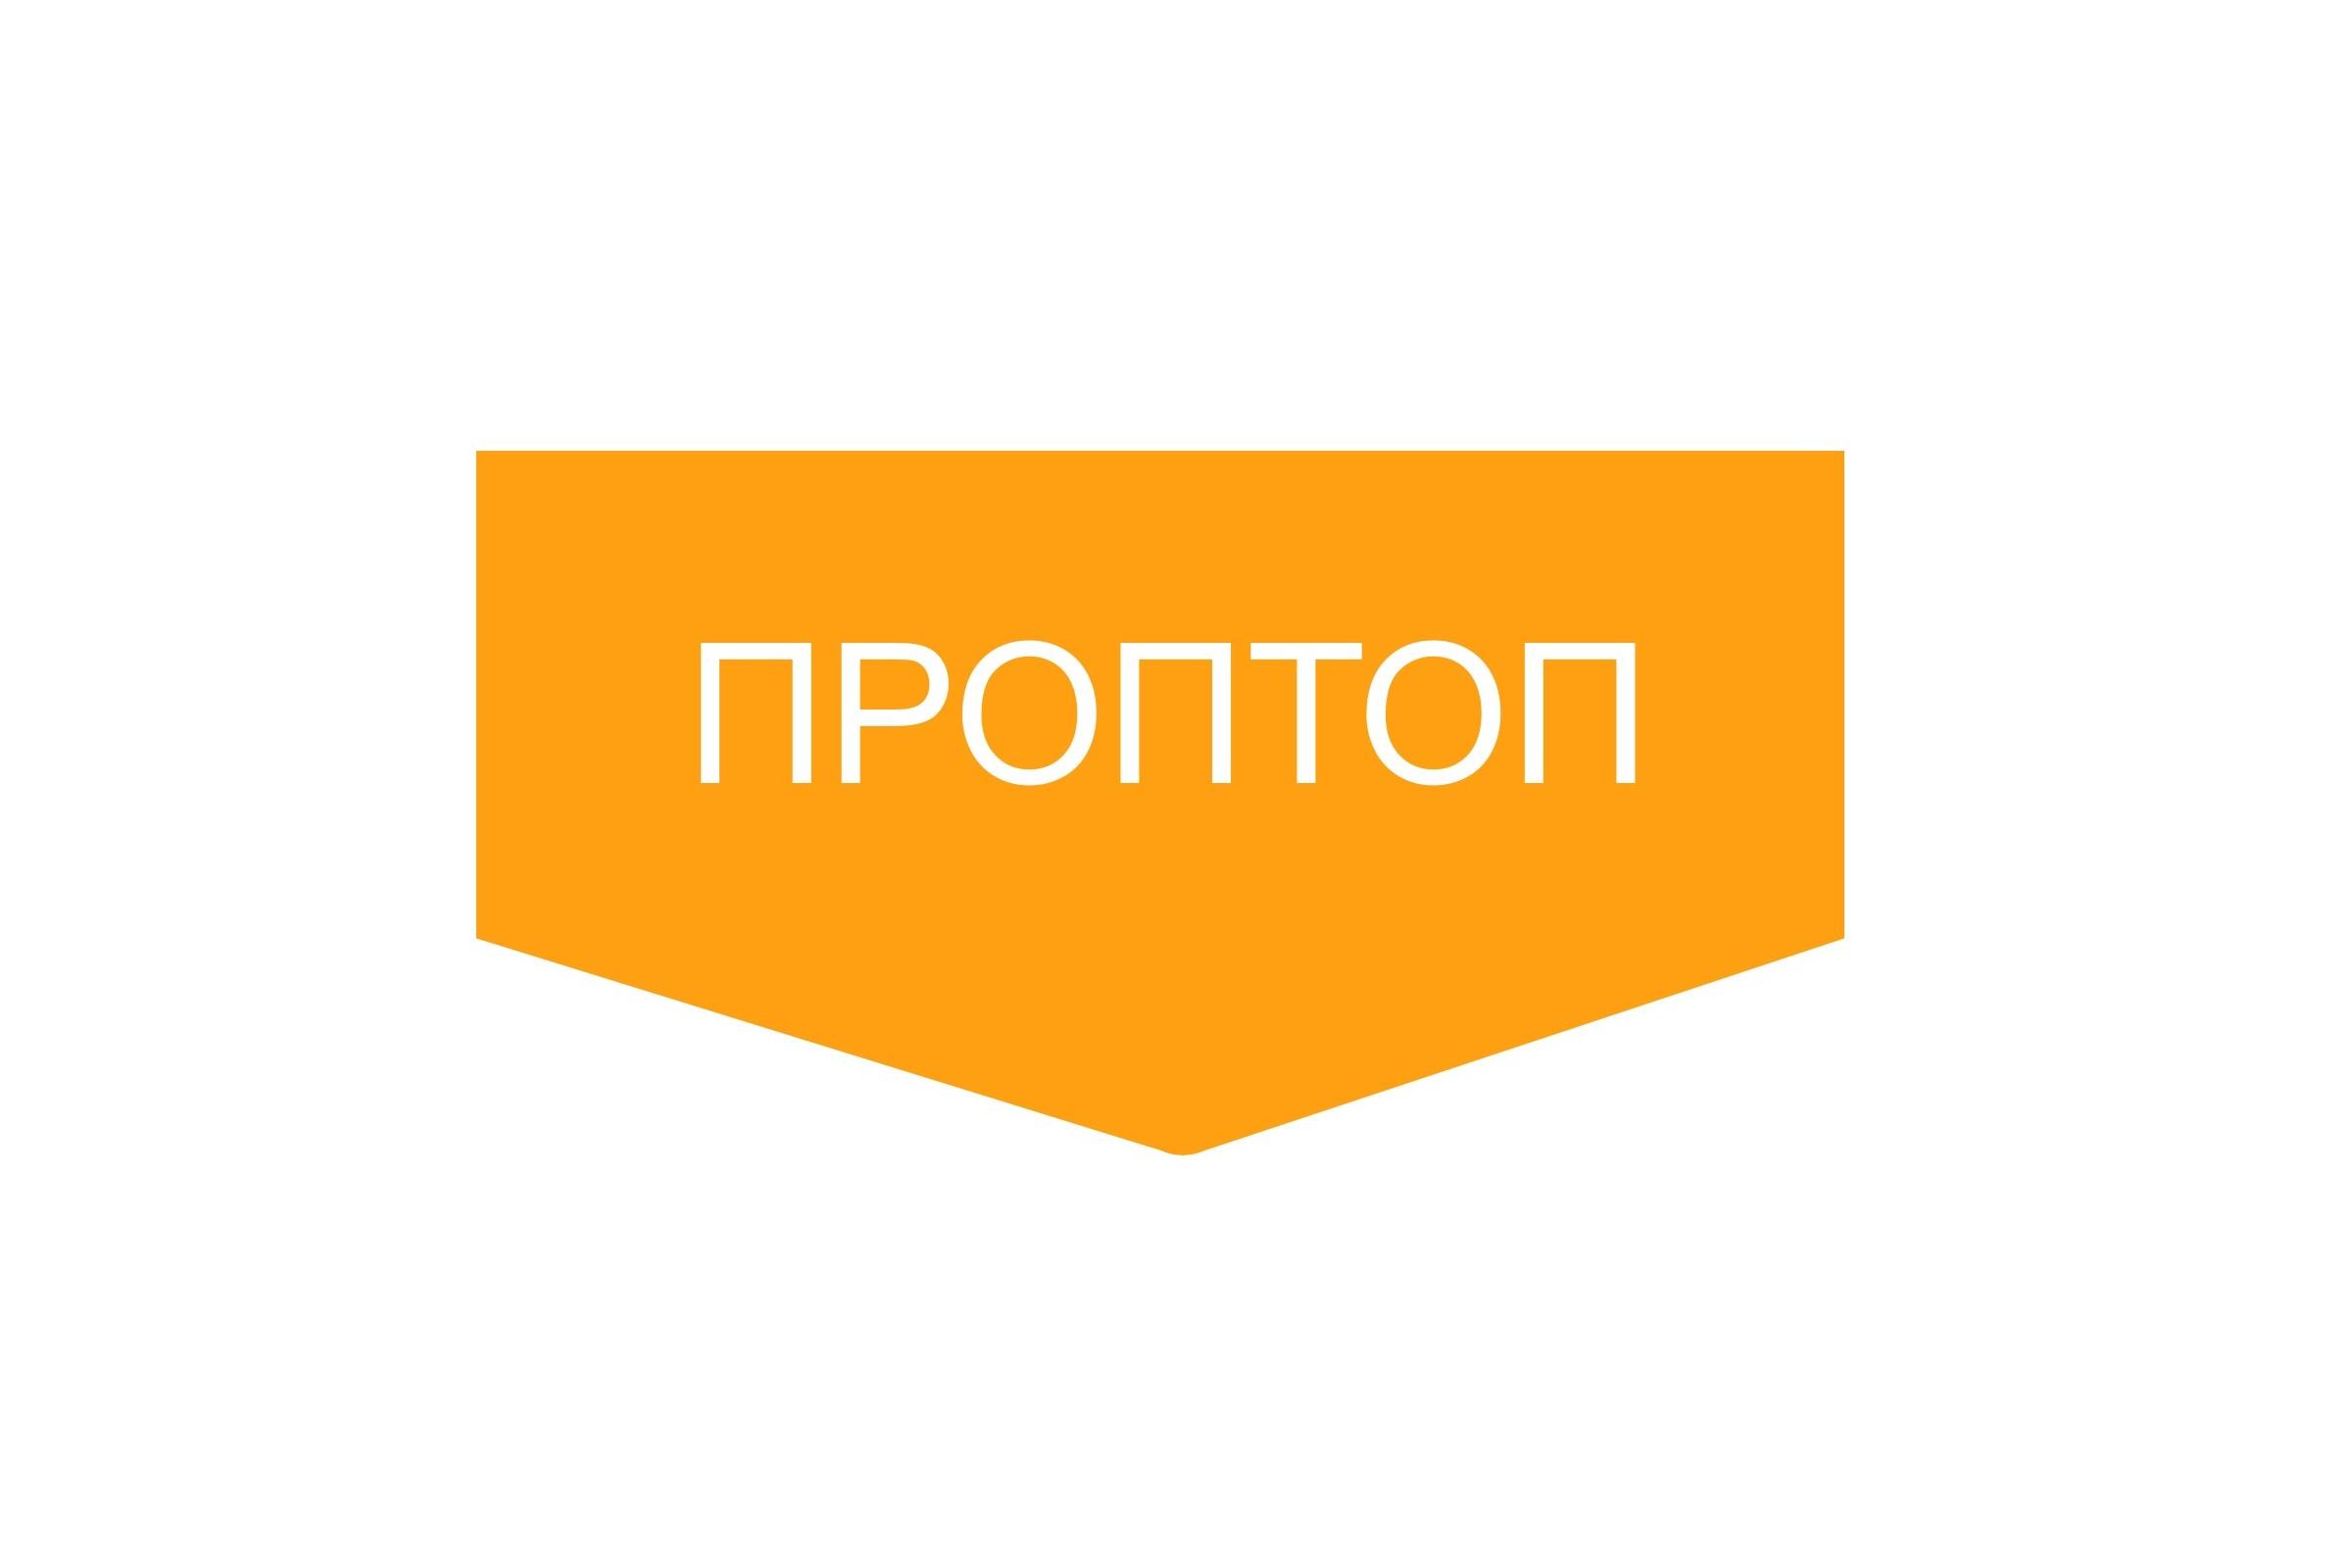 Проптоп